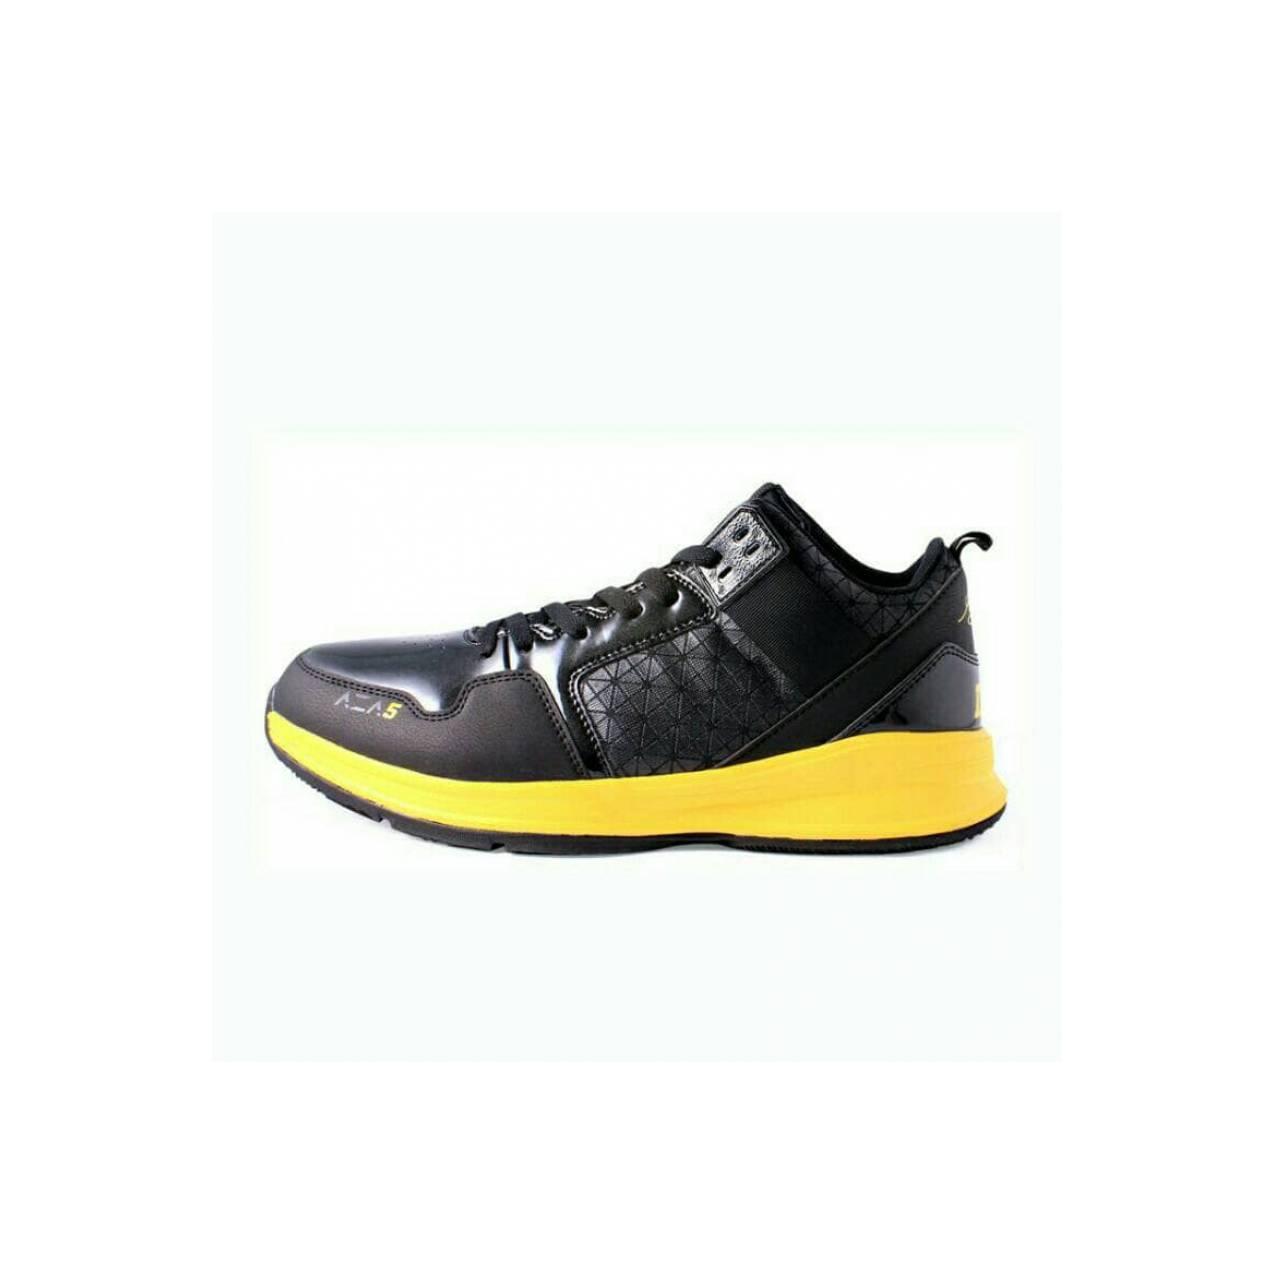 Kelebihan Proteam Bola Basket Pro1000 Dbl Size 7 Cokelat Terkini Sepatu Ardiles Aza Original